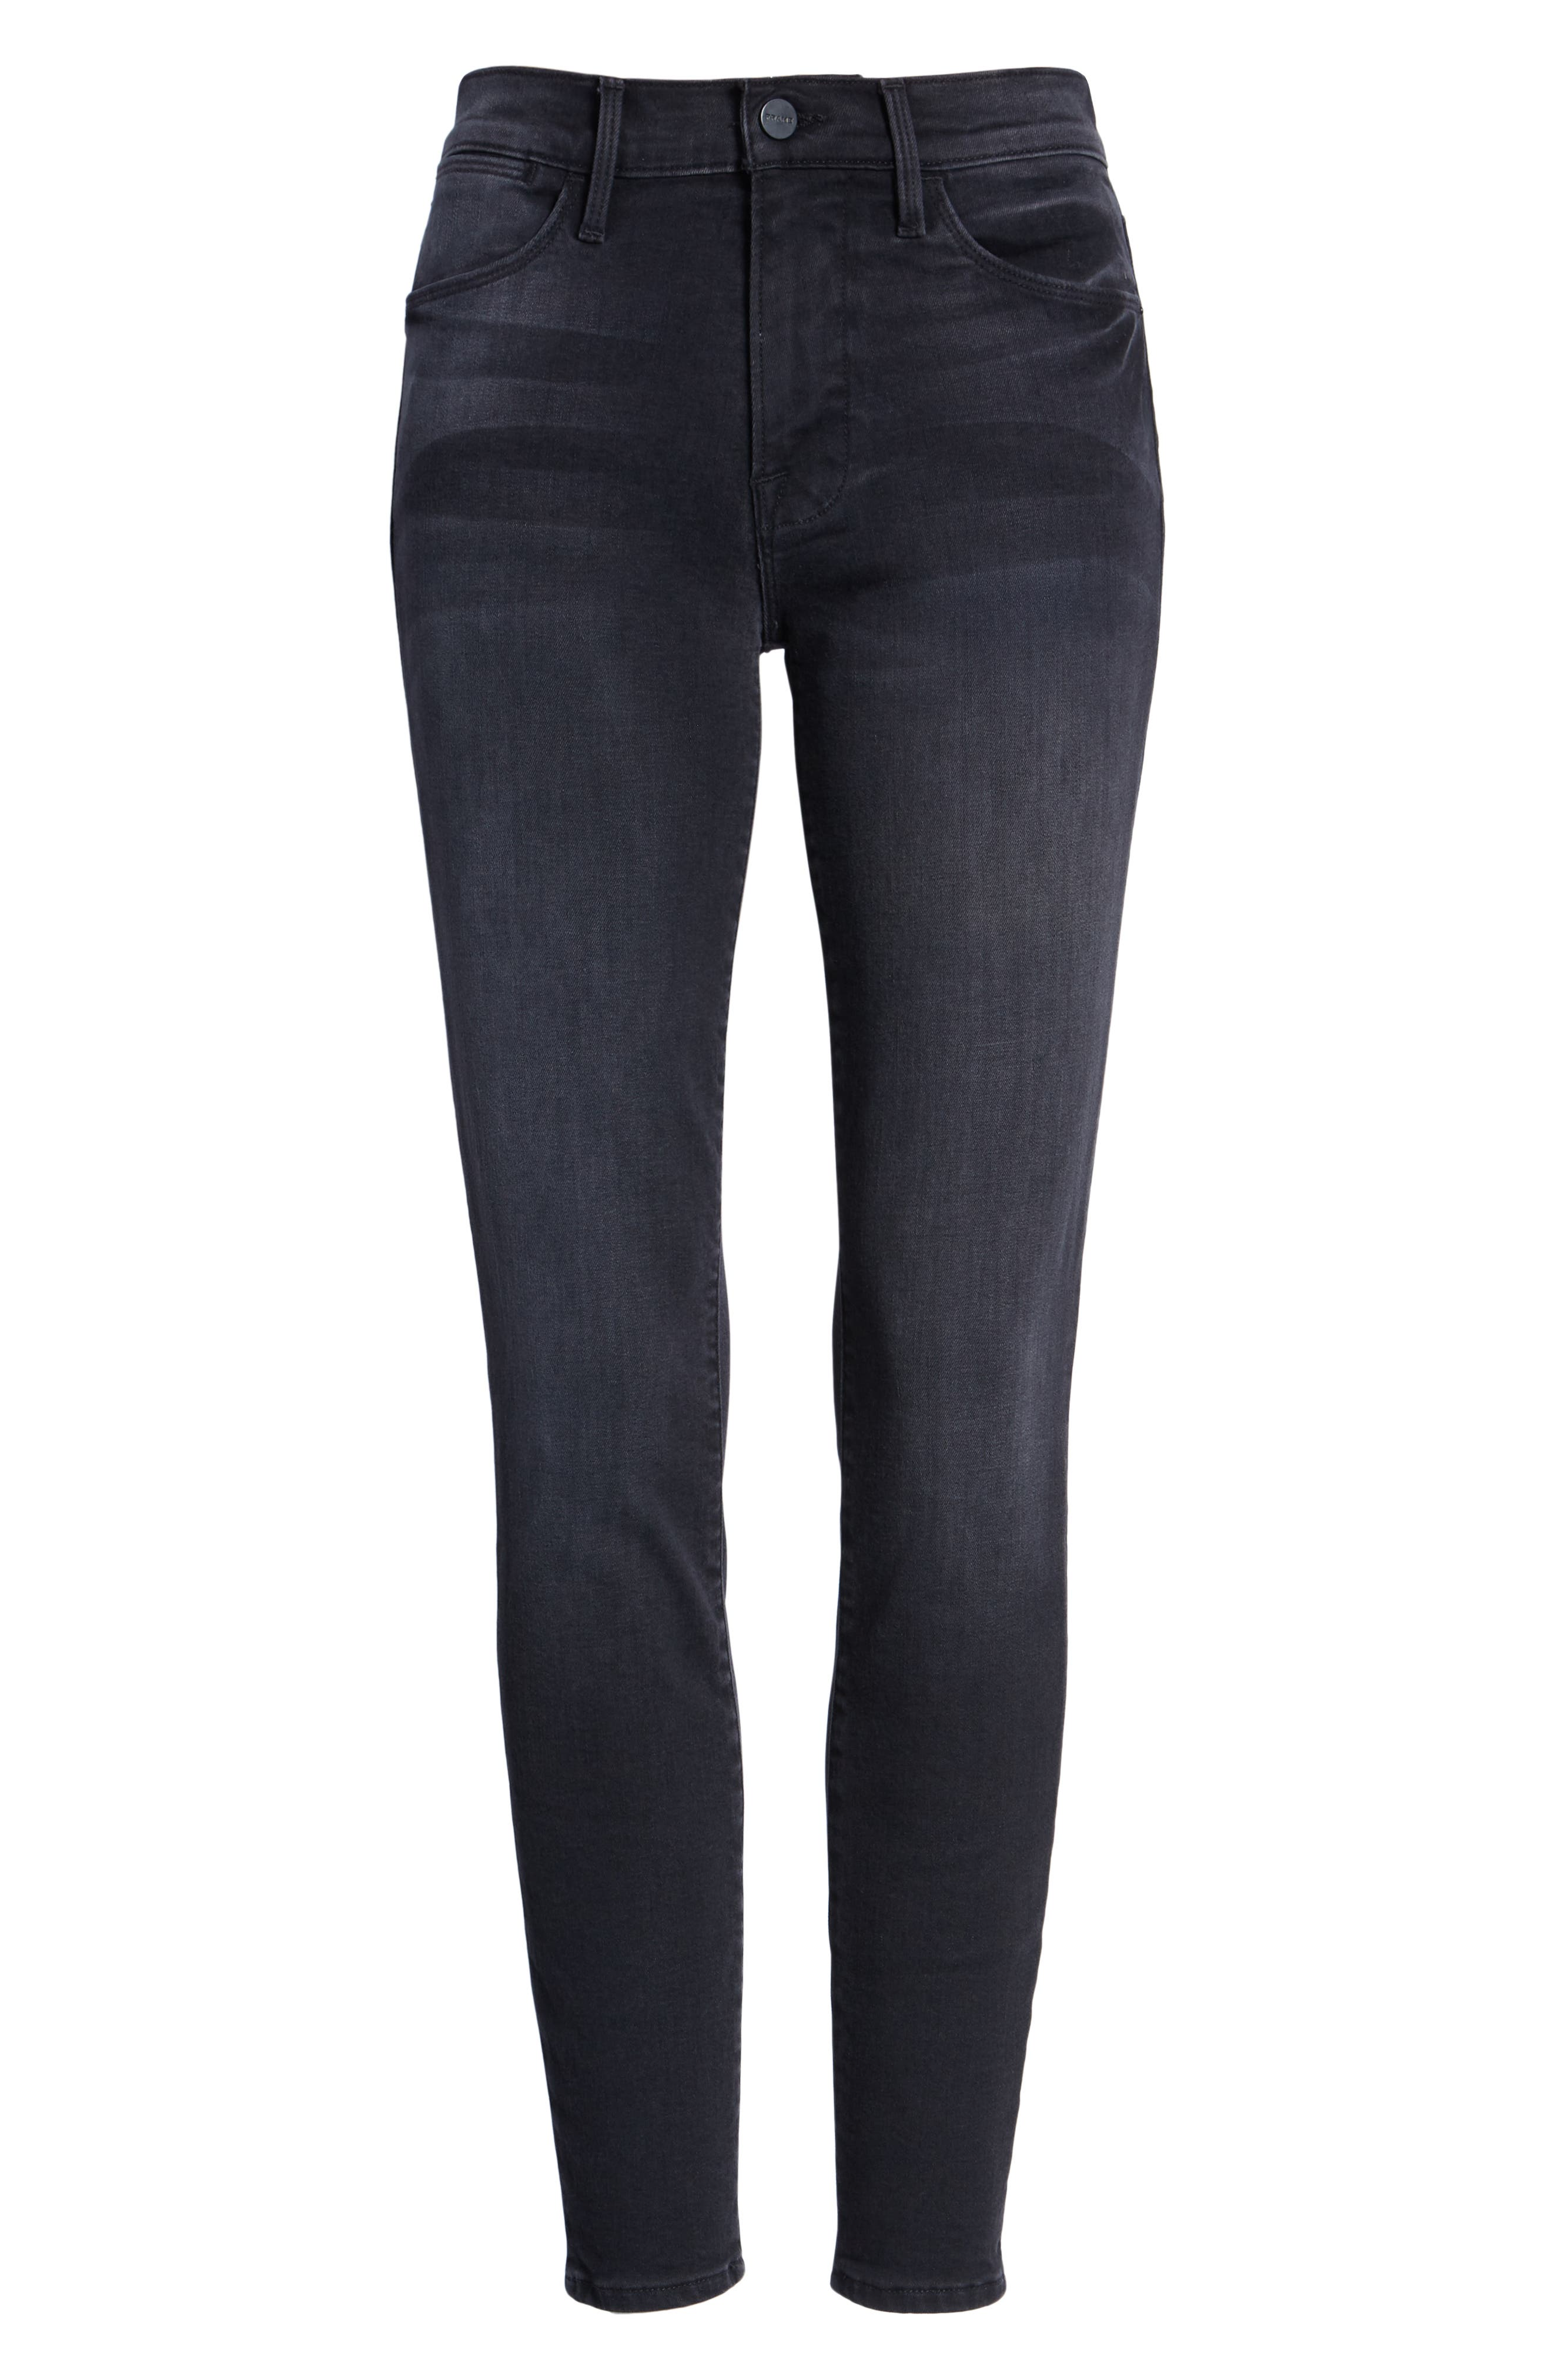 Le High Skinny Jeans,                             Alternate thumbnail 7, color,                             NIGHTFALL